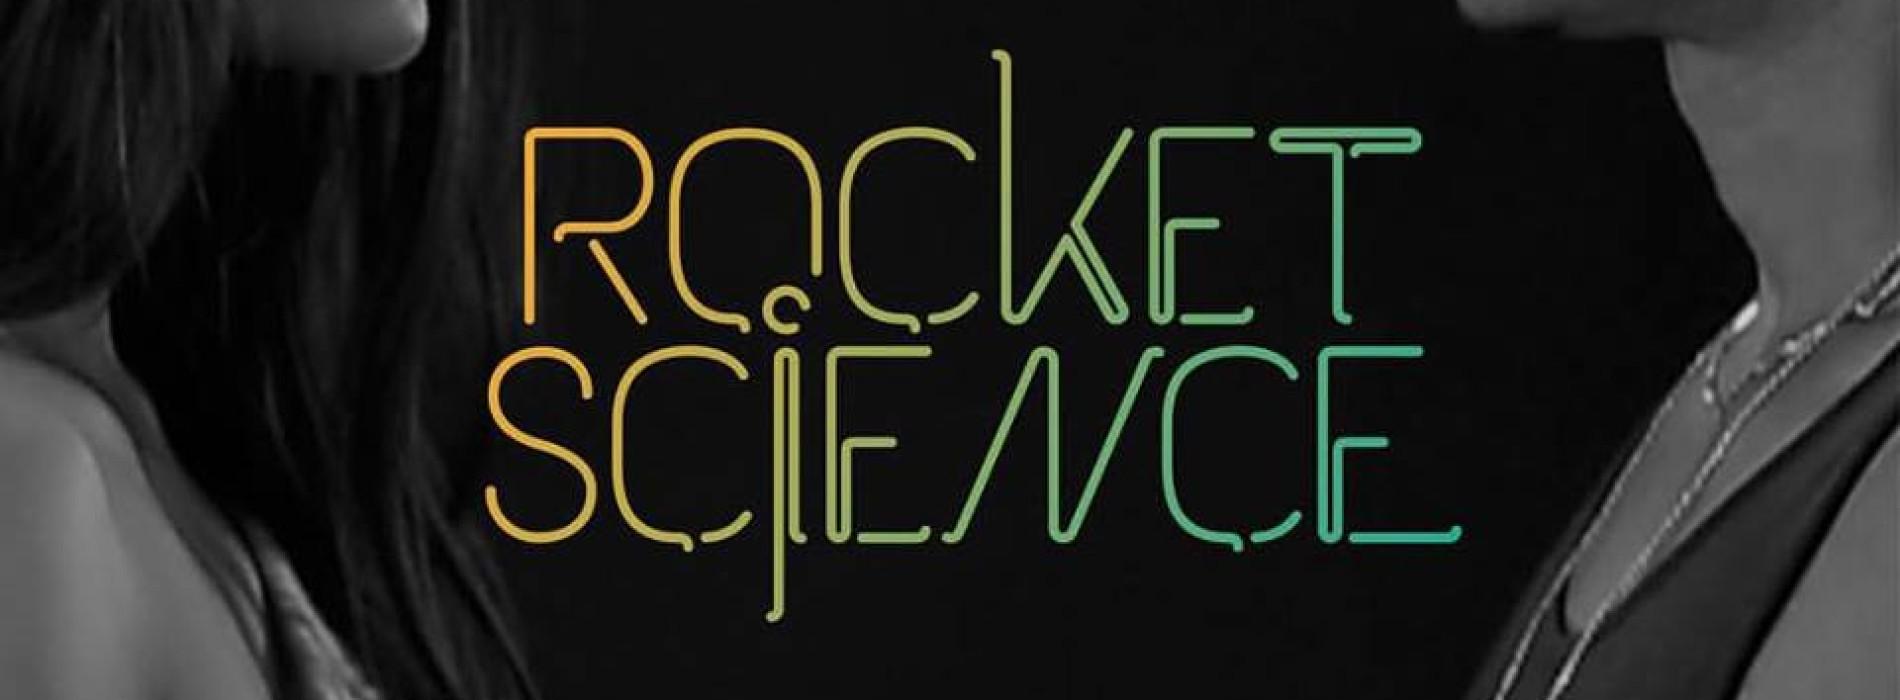 Andrew De Silva – Rocket Science